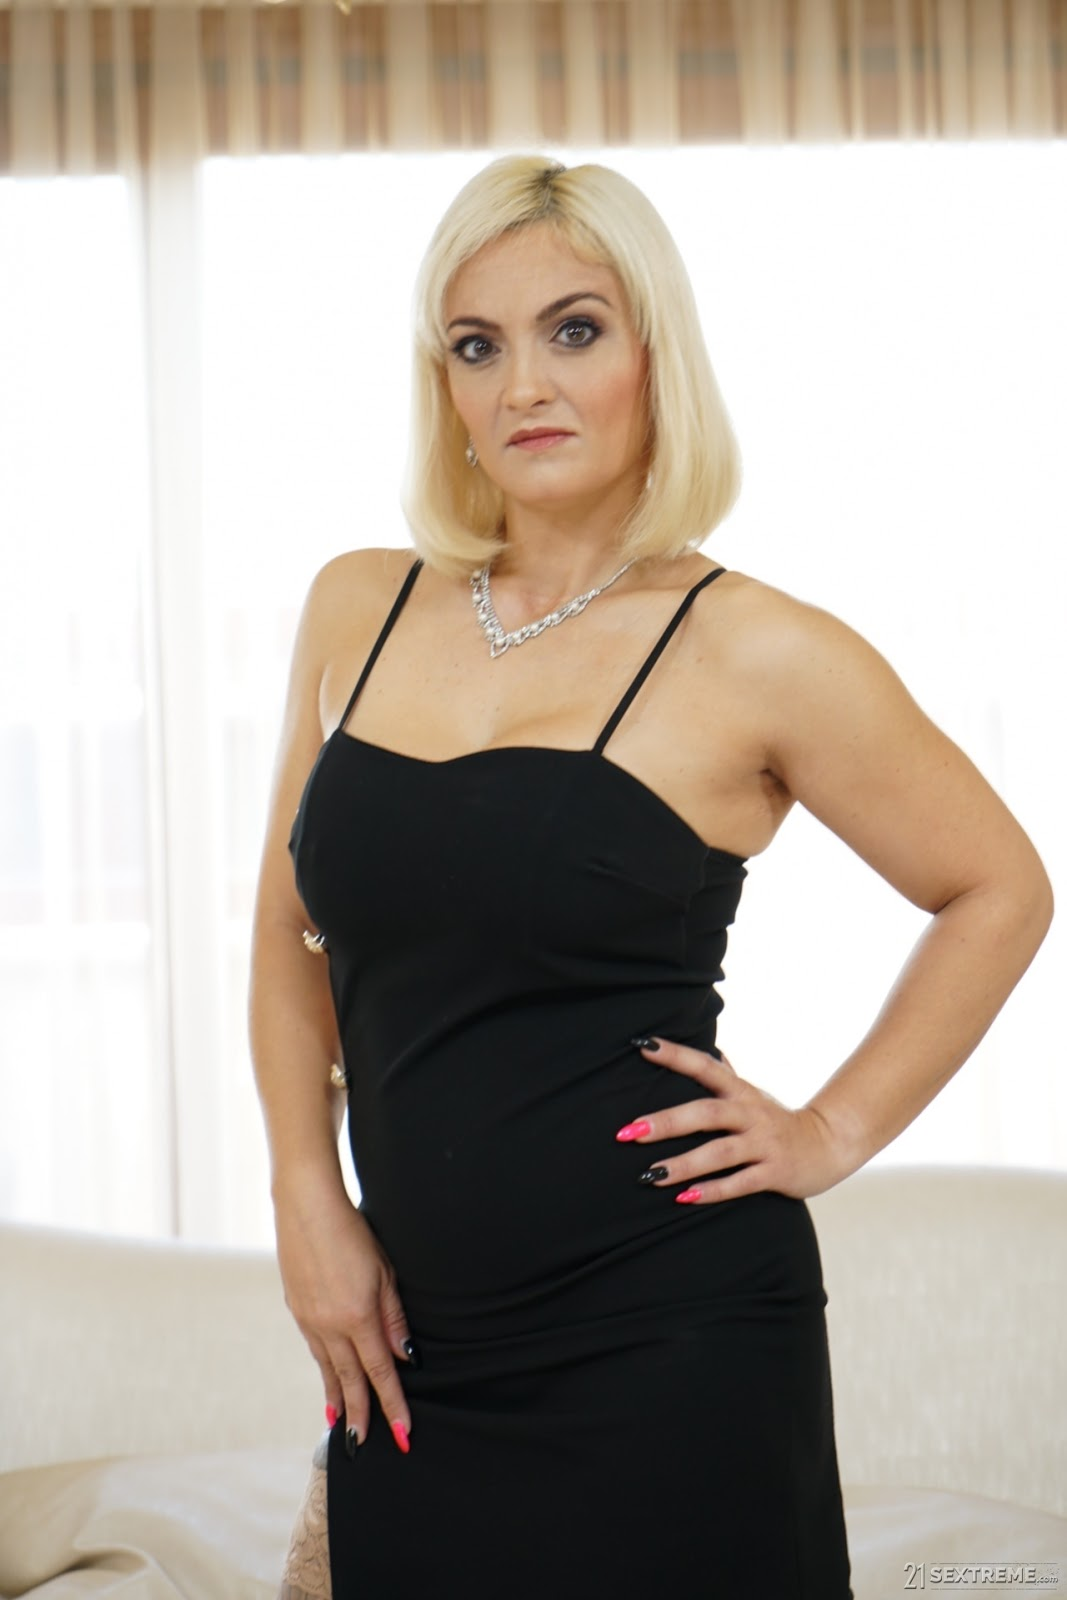 My Private Gigolo,21 SEXTREME, 4K, Anal, Threesome, Uncensored, Westen, Westen Porn,Mugur ,Mary Rider